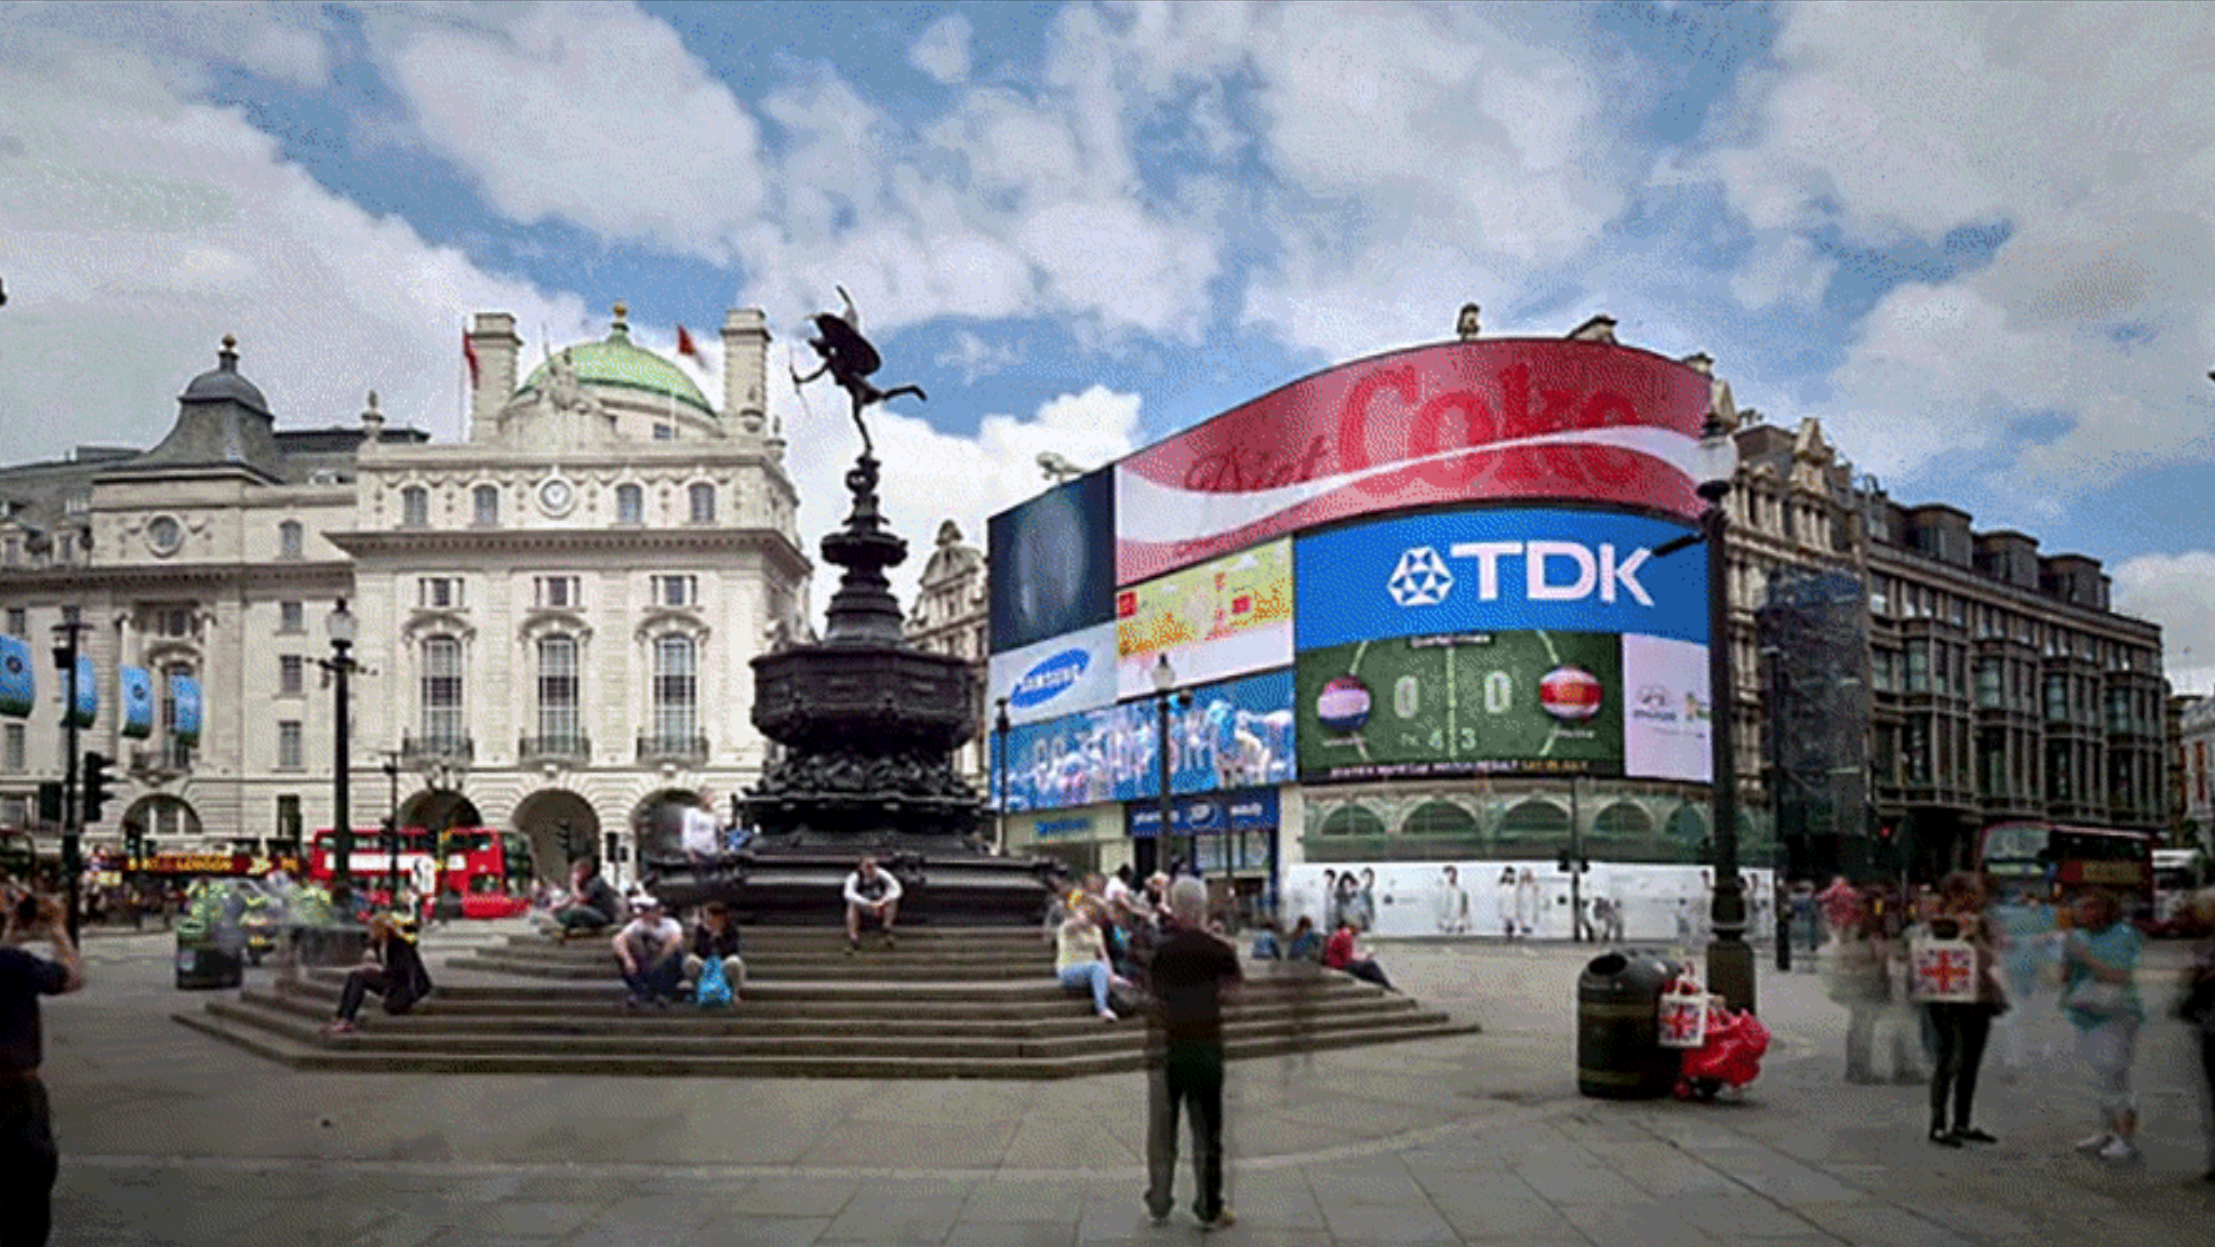 Bringing Billboards Into the Digital Age